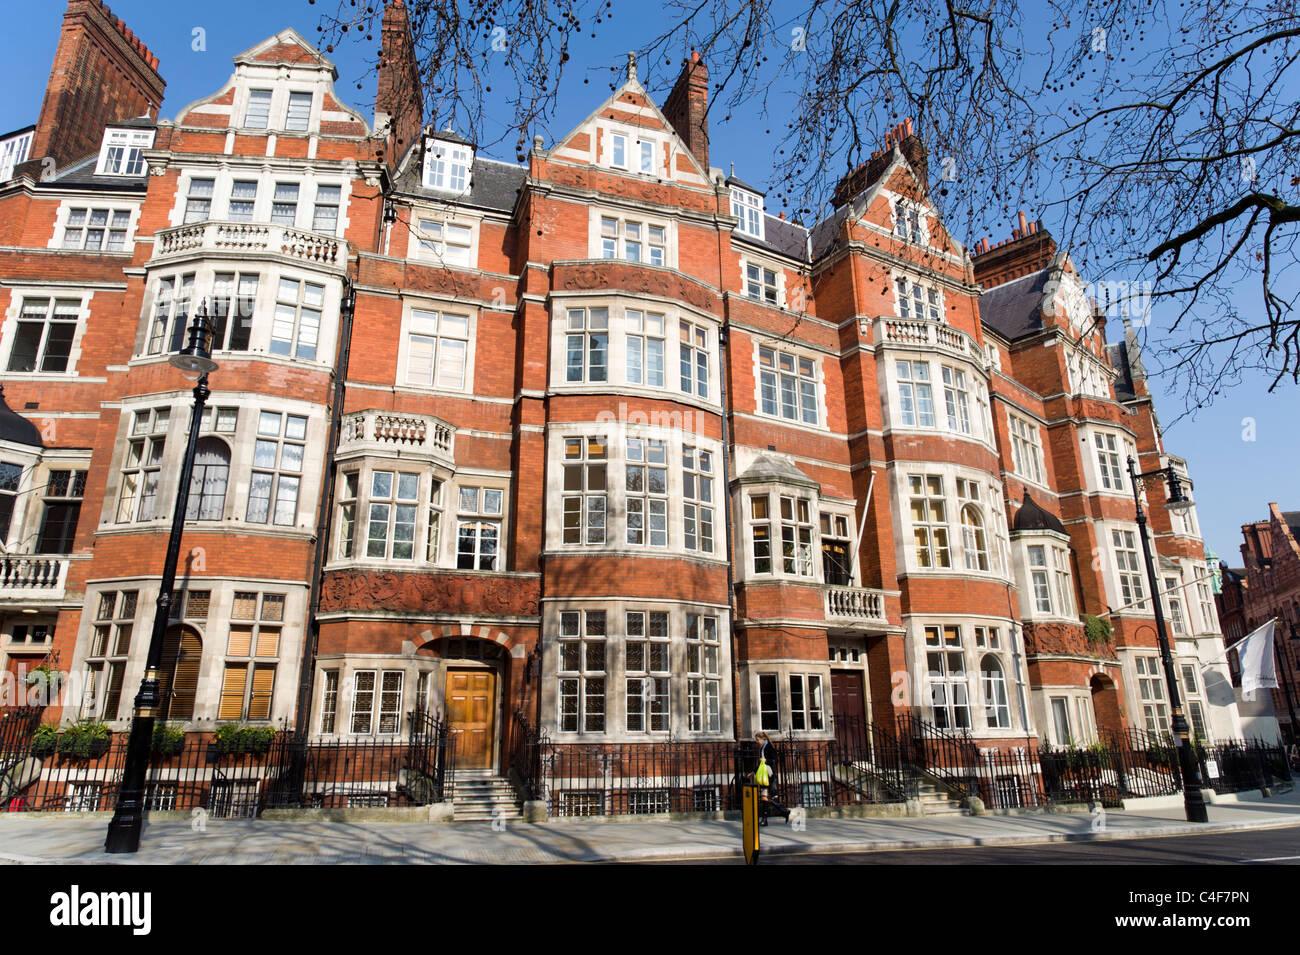 Buildings on Carlos Place, Mayfair, London, UK Stock Photo